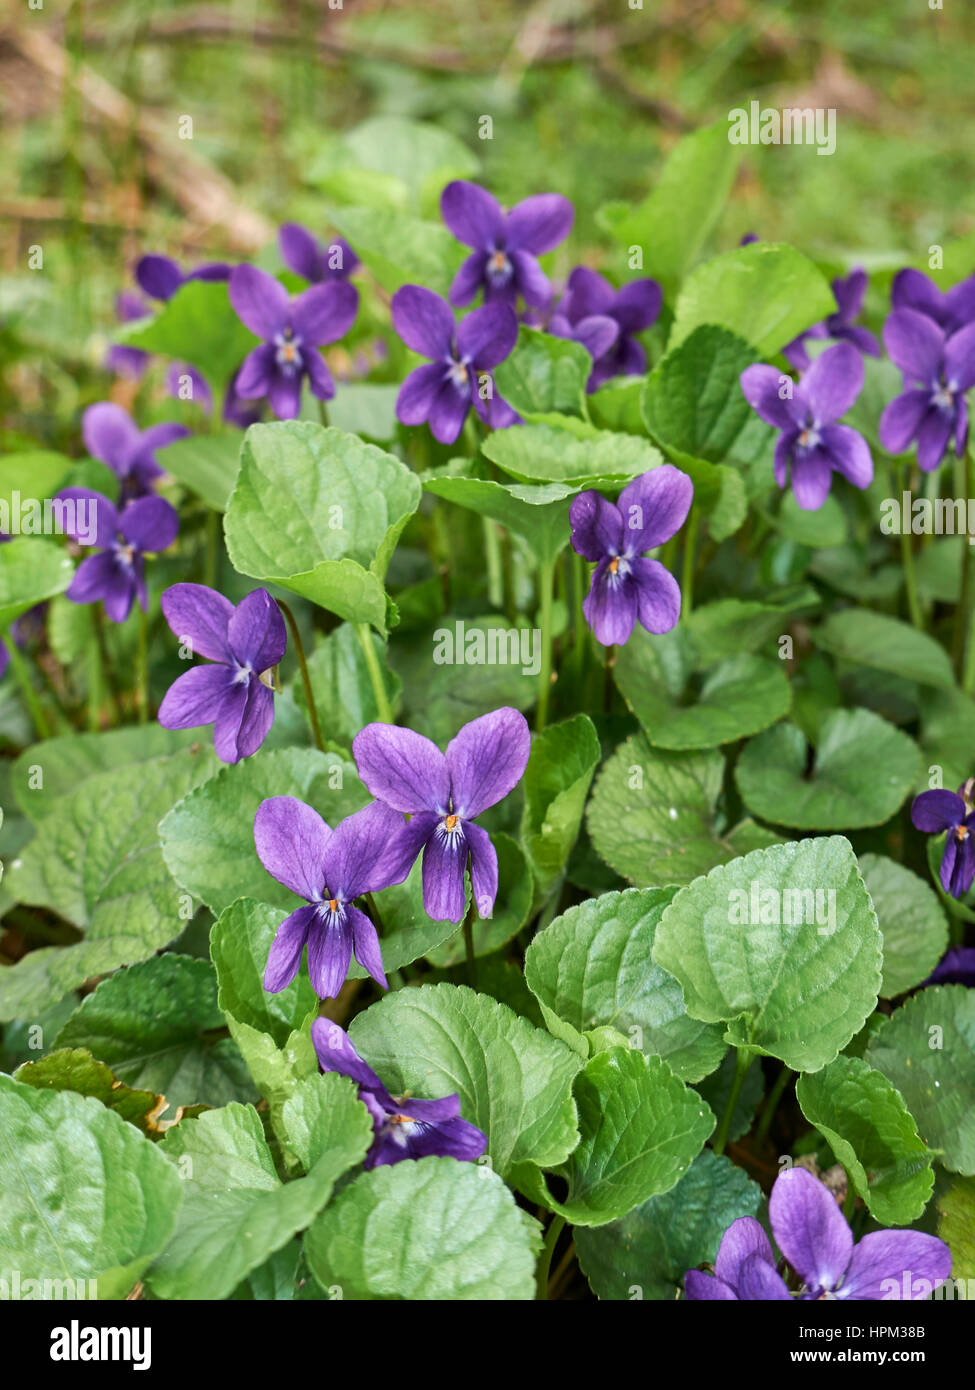 Viola odorata - Stock Image